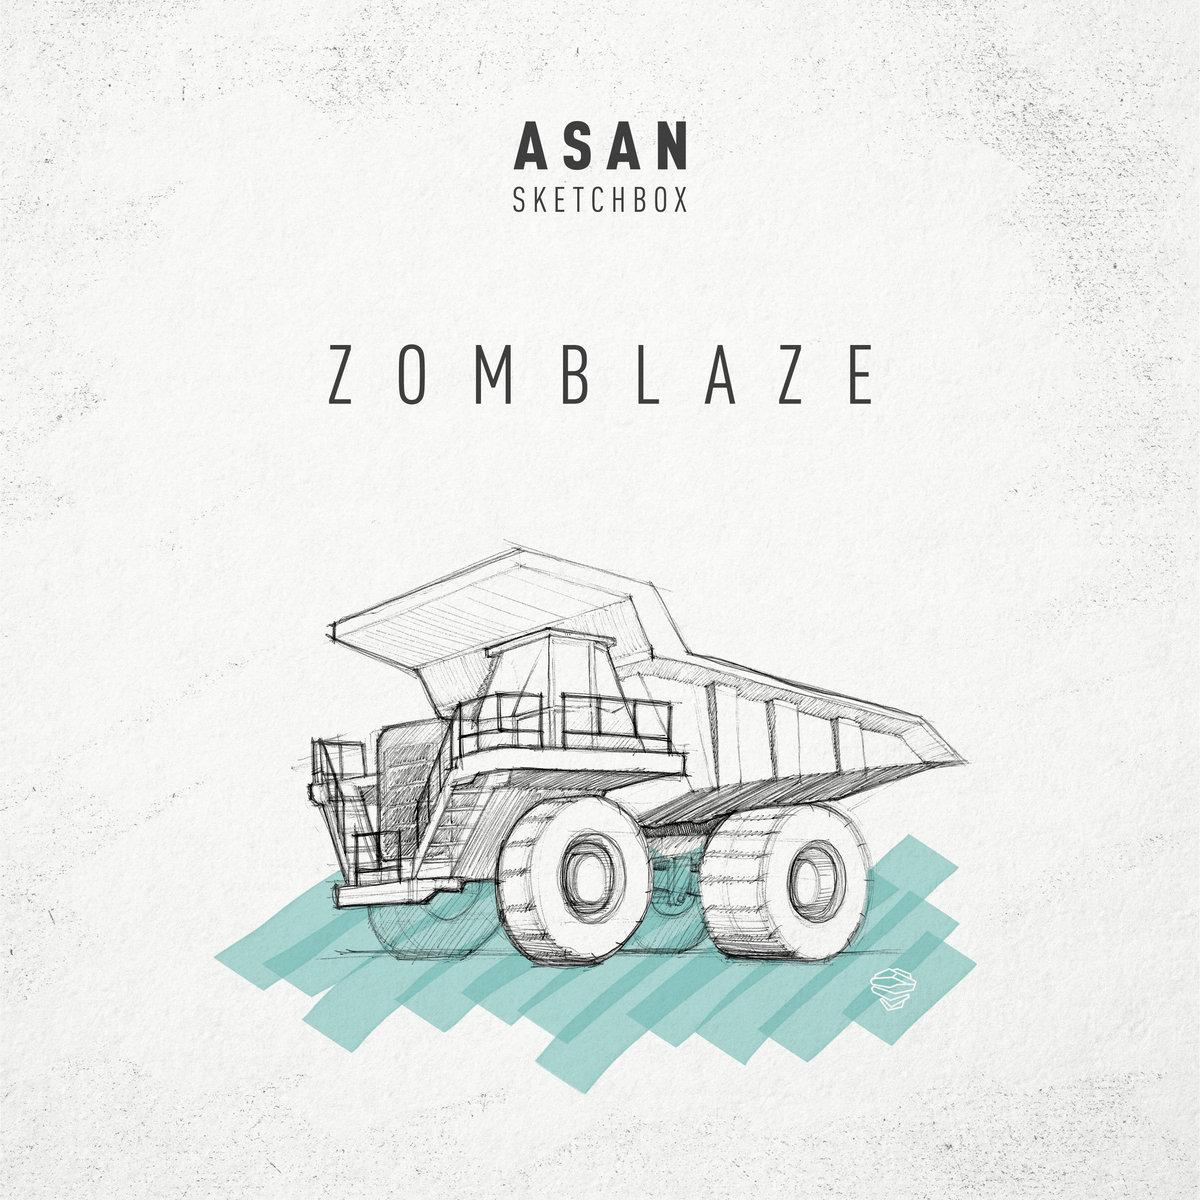 Zomblaze – ASAN Sketchbox